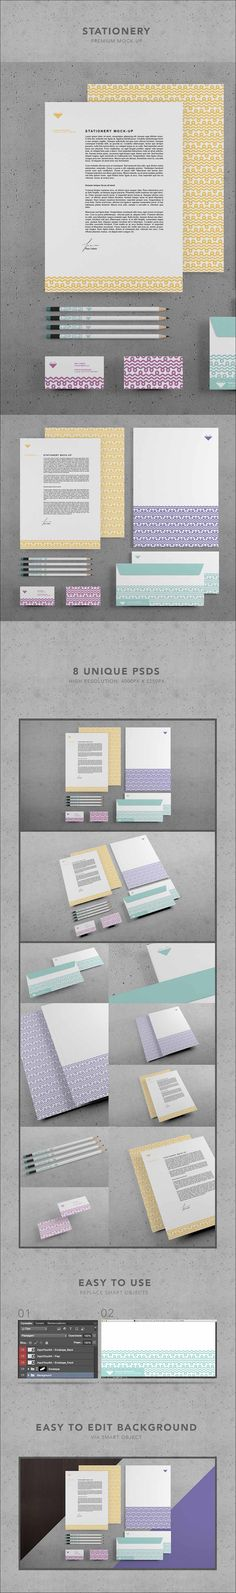 7+ Branding Stationery #Free #PSD #Mockup :